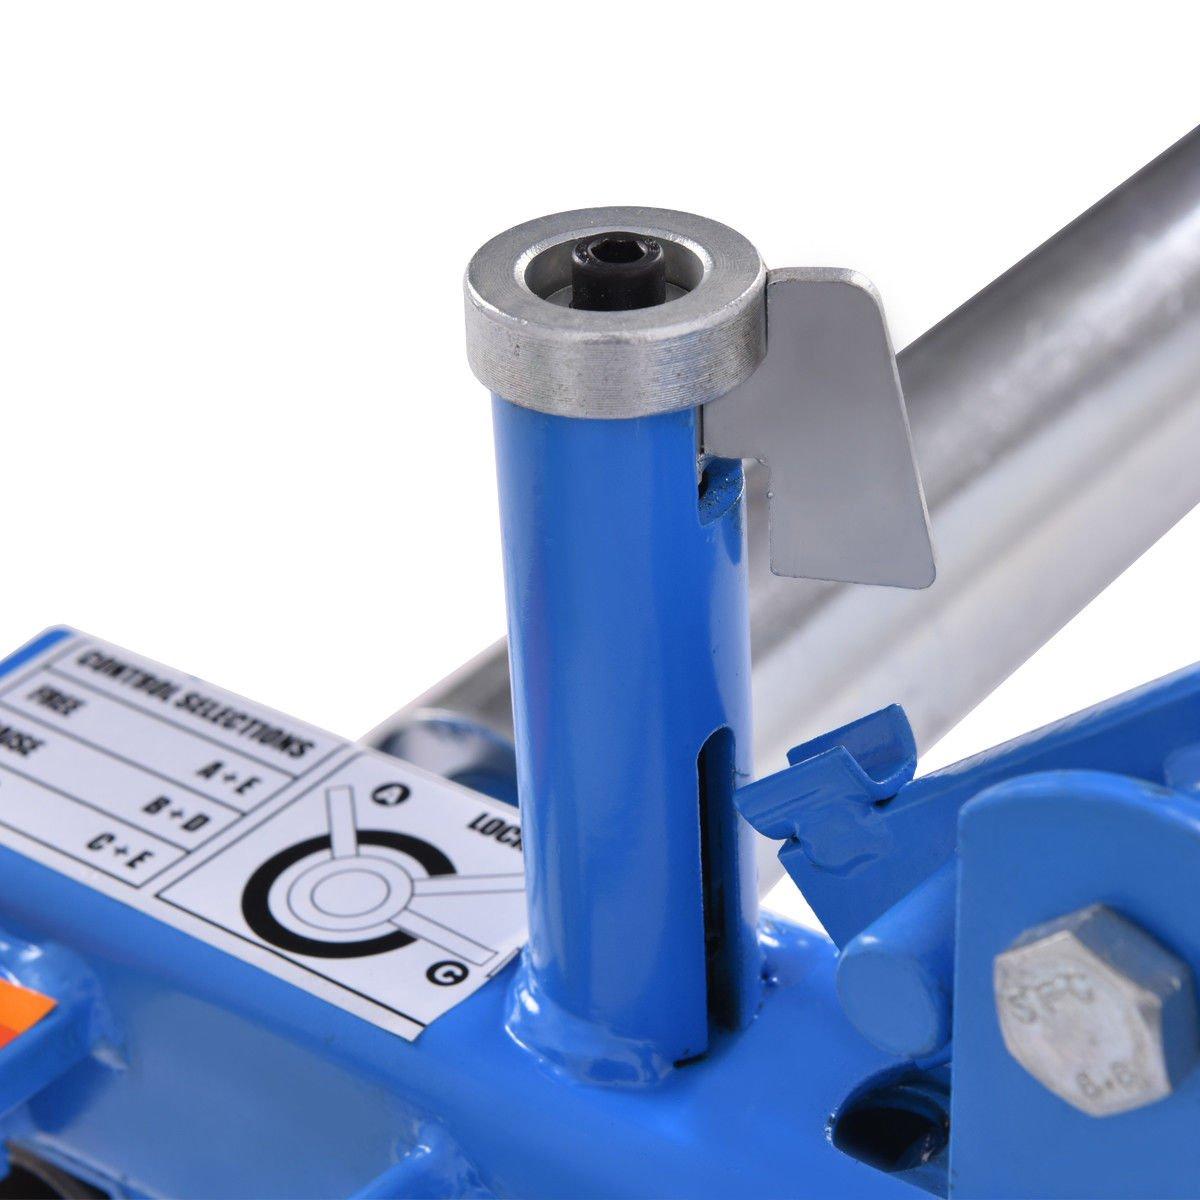 Goplus Wheel Dolly Car Skates Vehicle Positioning Hydraulic Tire Jack, 1250 lb (Blue) by Goplus (Image #7)